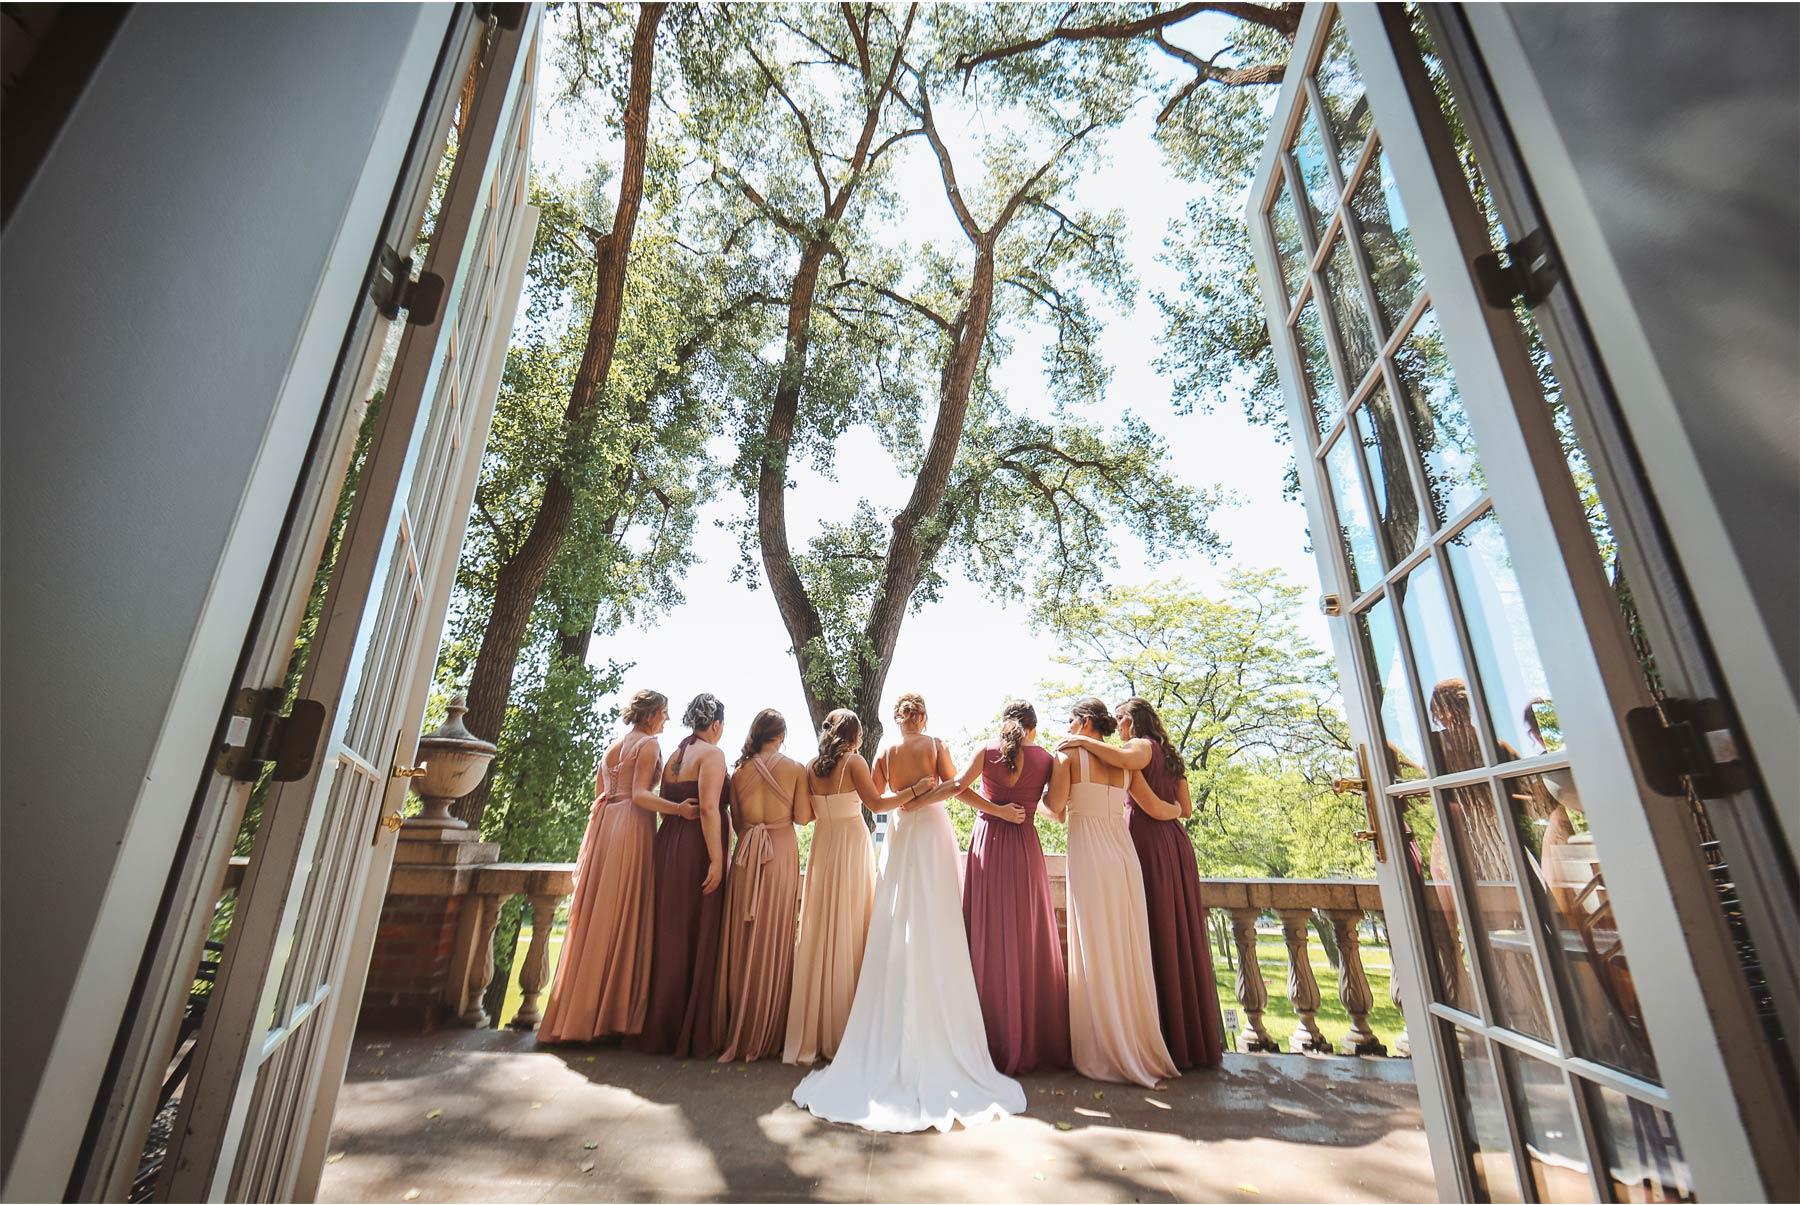 08-Minneapolis-Minnesota-Wedding-Andrew-Vick-Photography-Calhoun-Beach-Club-Bride-Bridesmaids-Pink-Wedding-Party-Samantha-and-Ryan.jpg